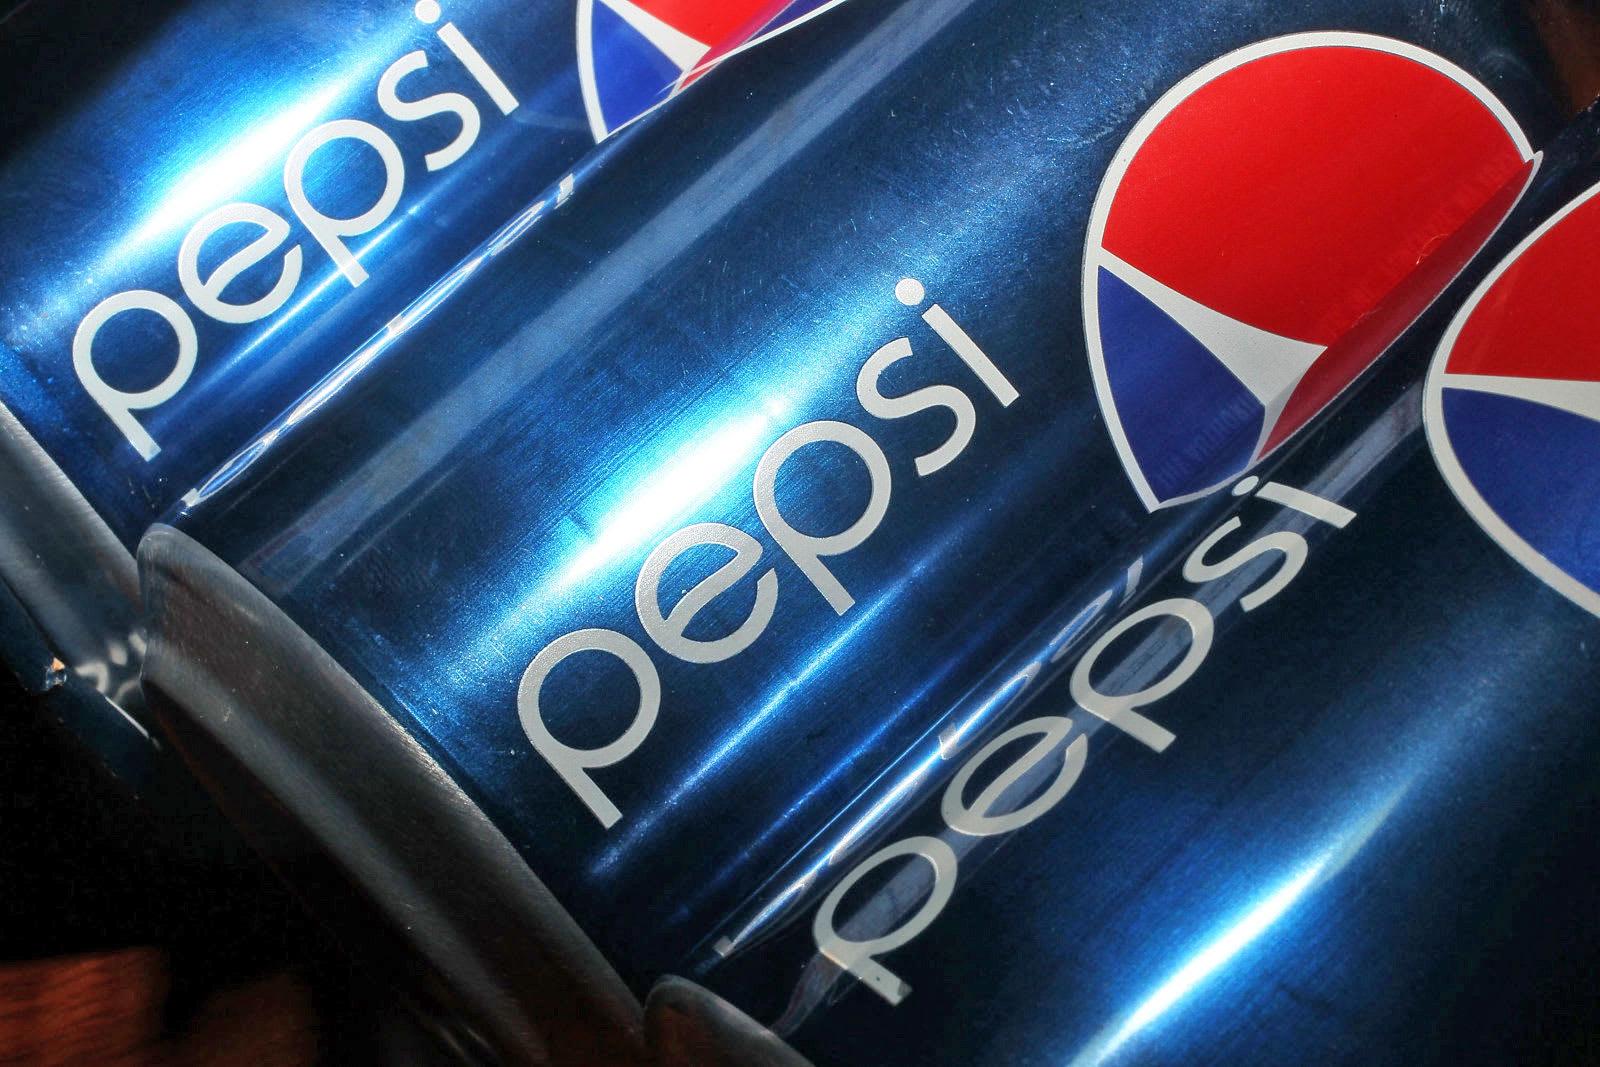 Pepsi's loyalty program puts cash in your Venmo account